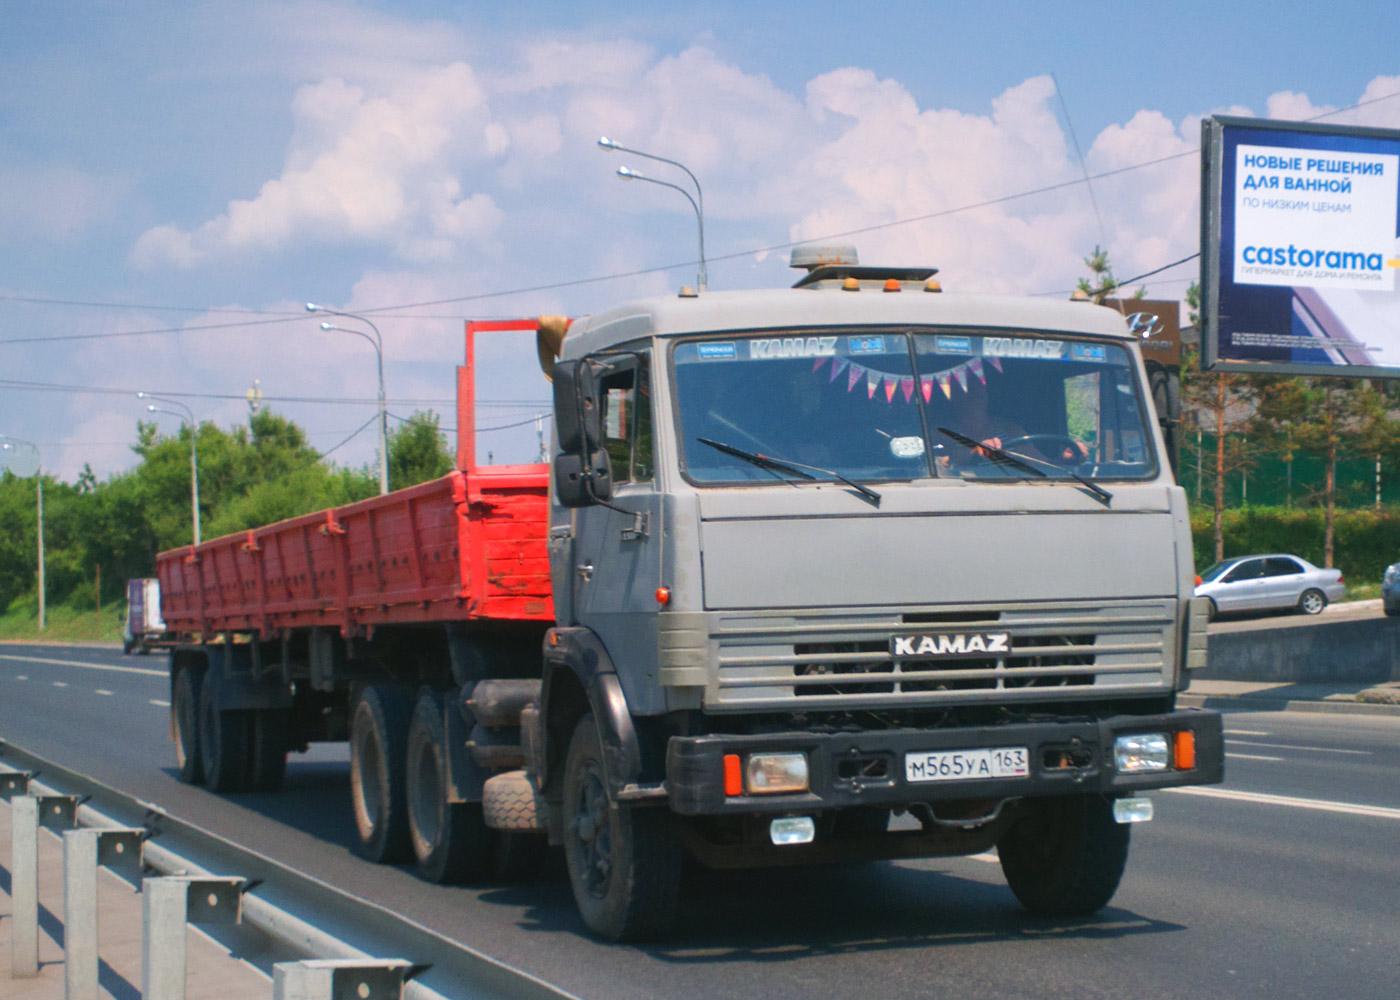 Седельный тягач на базе КамАЗ-5410 #М565УА163. Самара, Демократическая улица